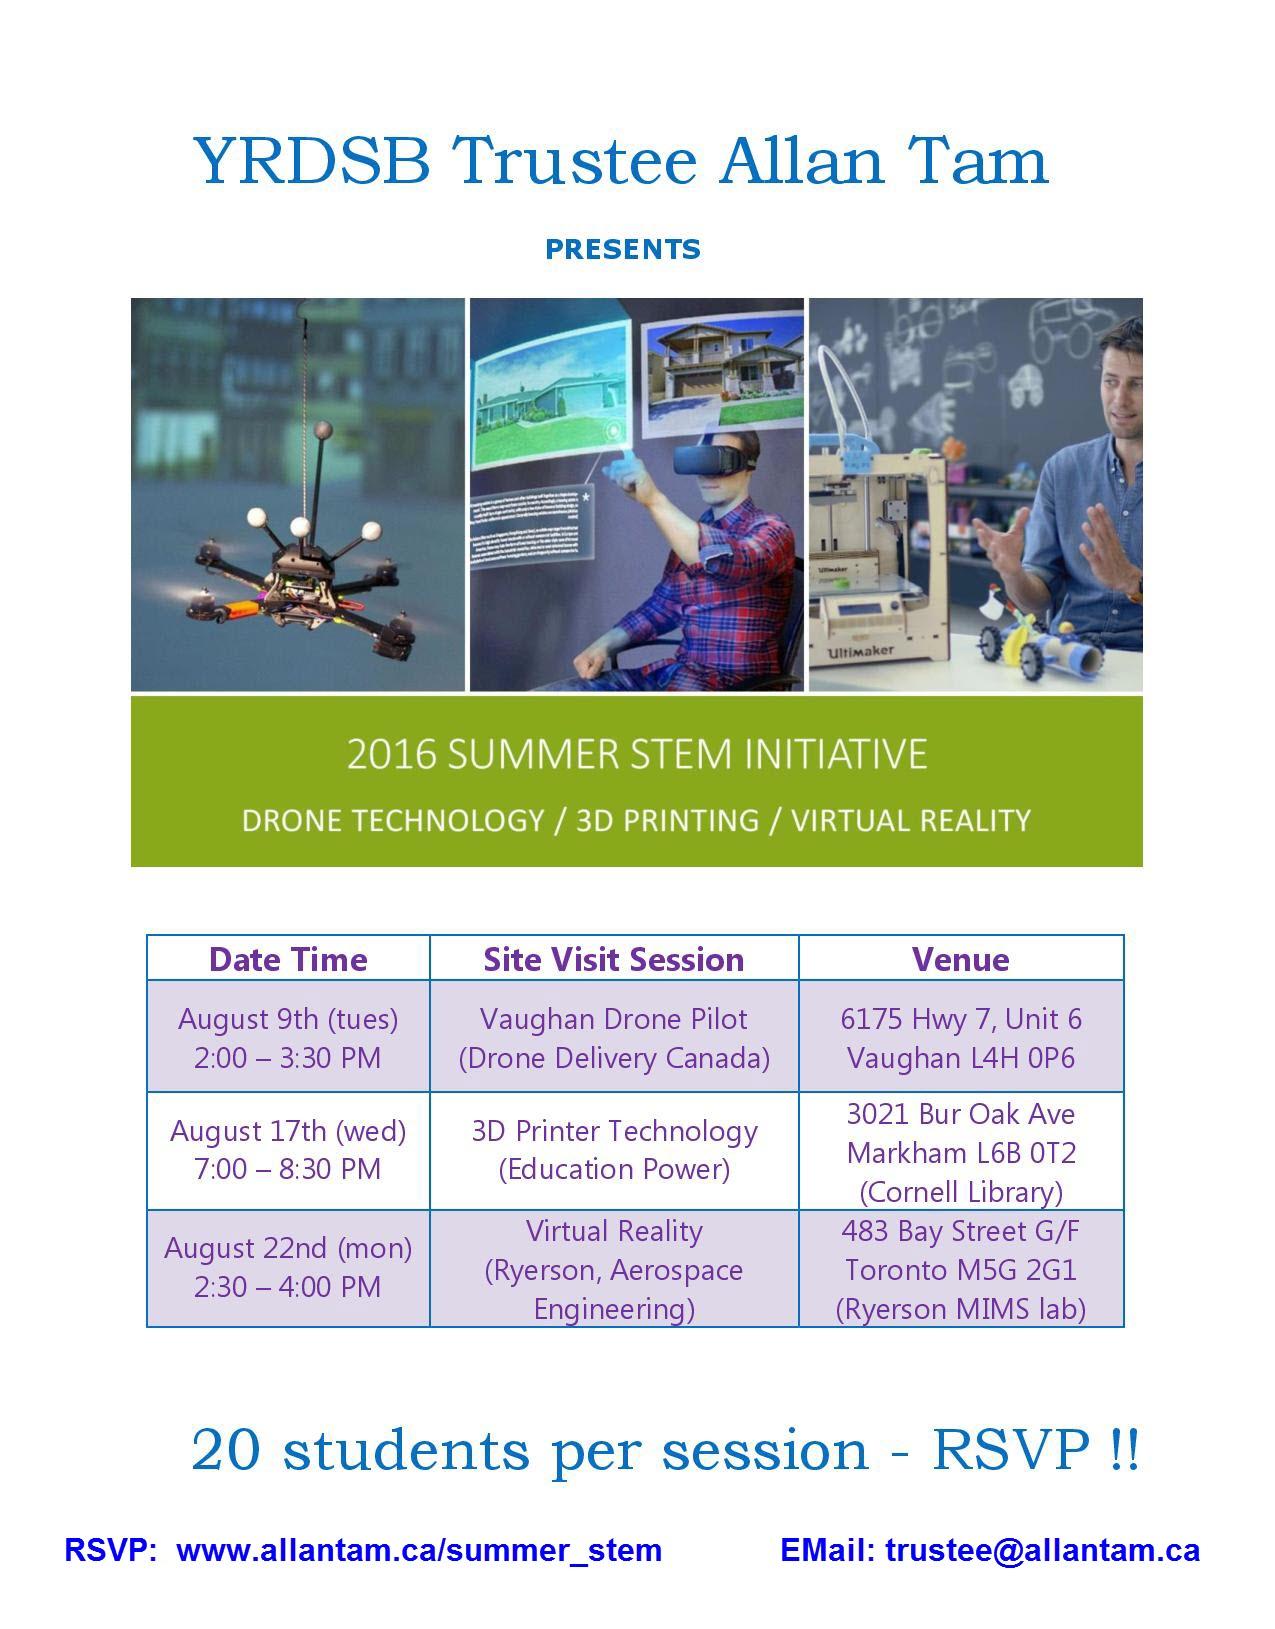 2016_Summer_STEM_Initiative_Allan_Tam-page-001_(2).jpg